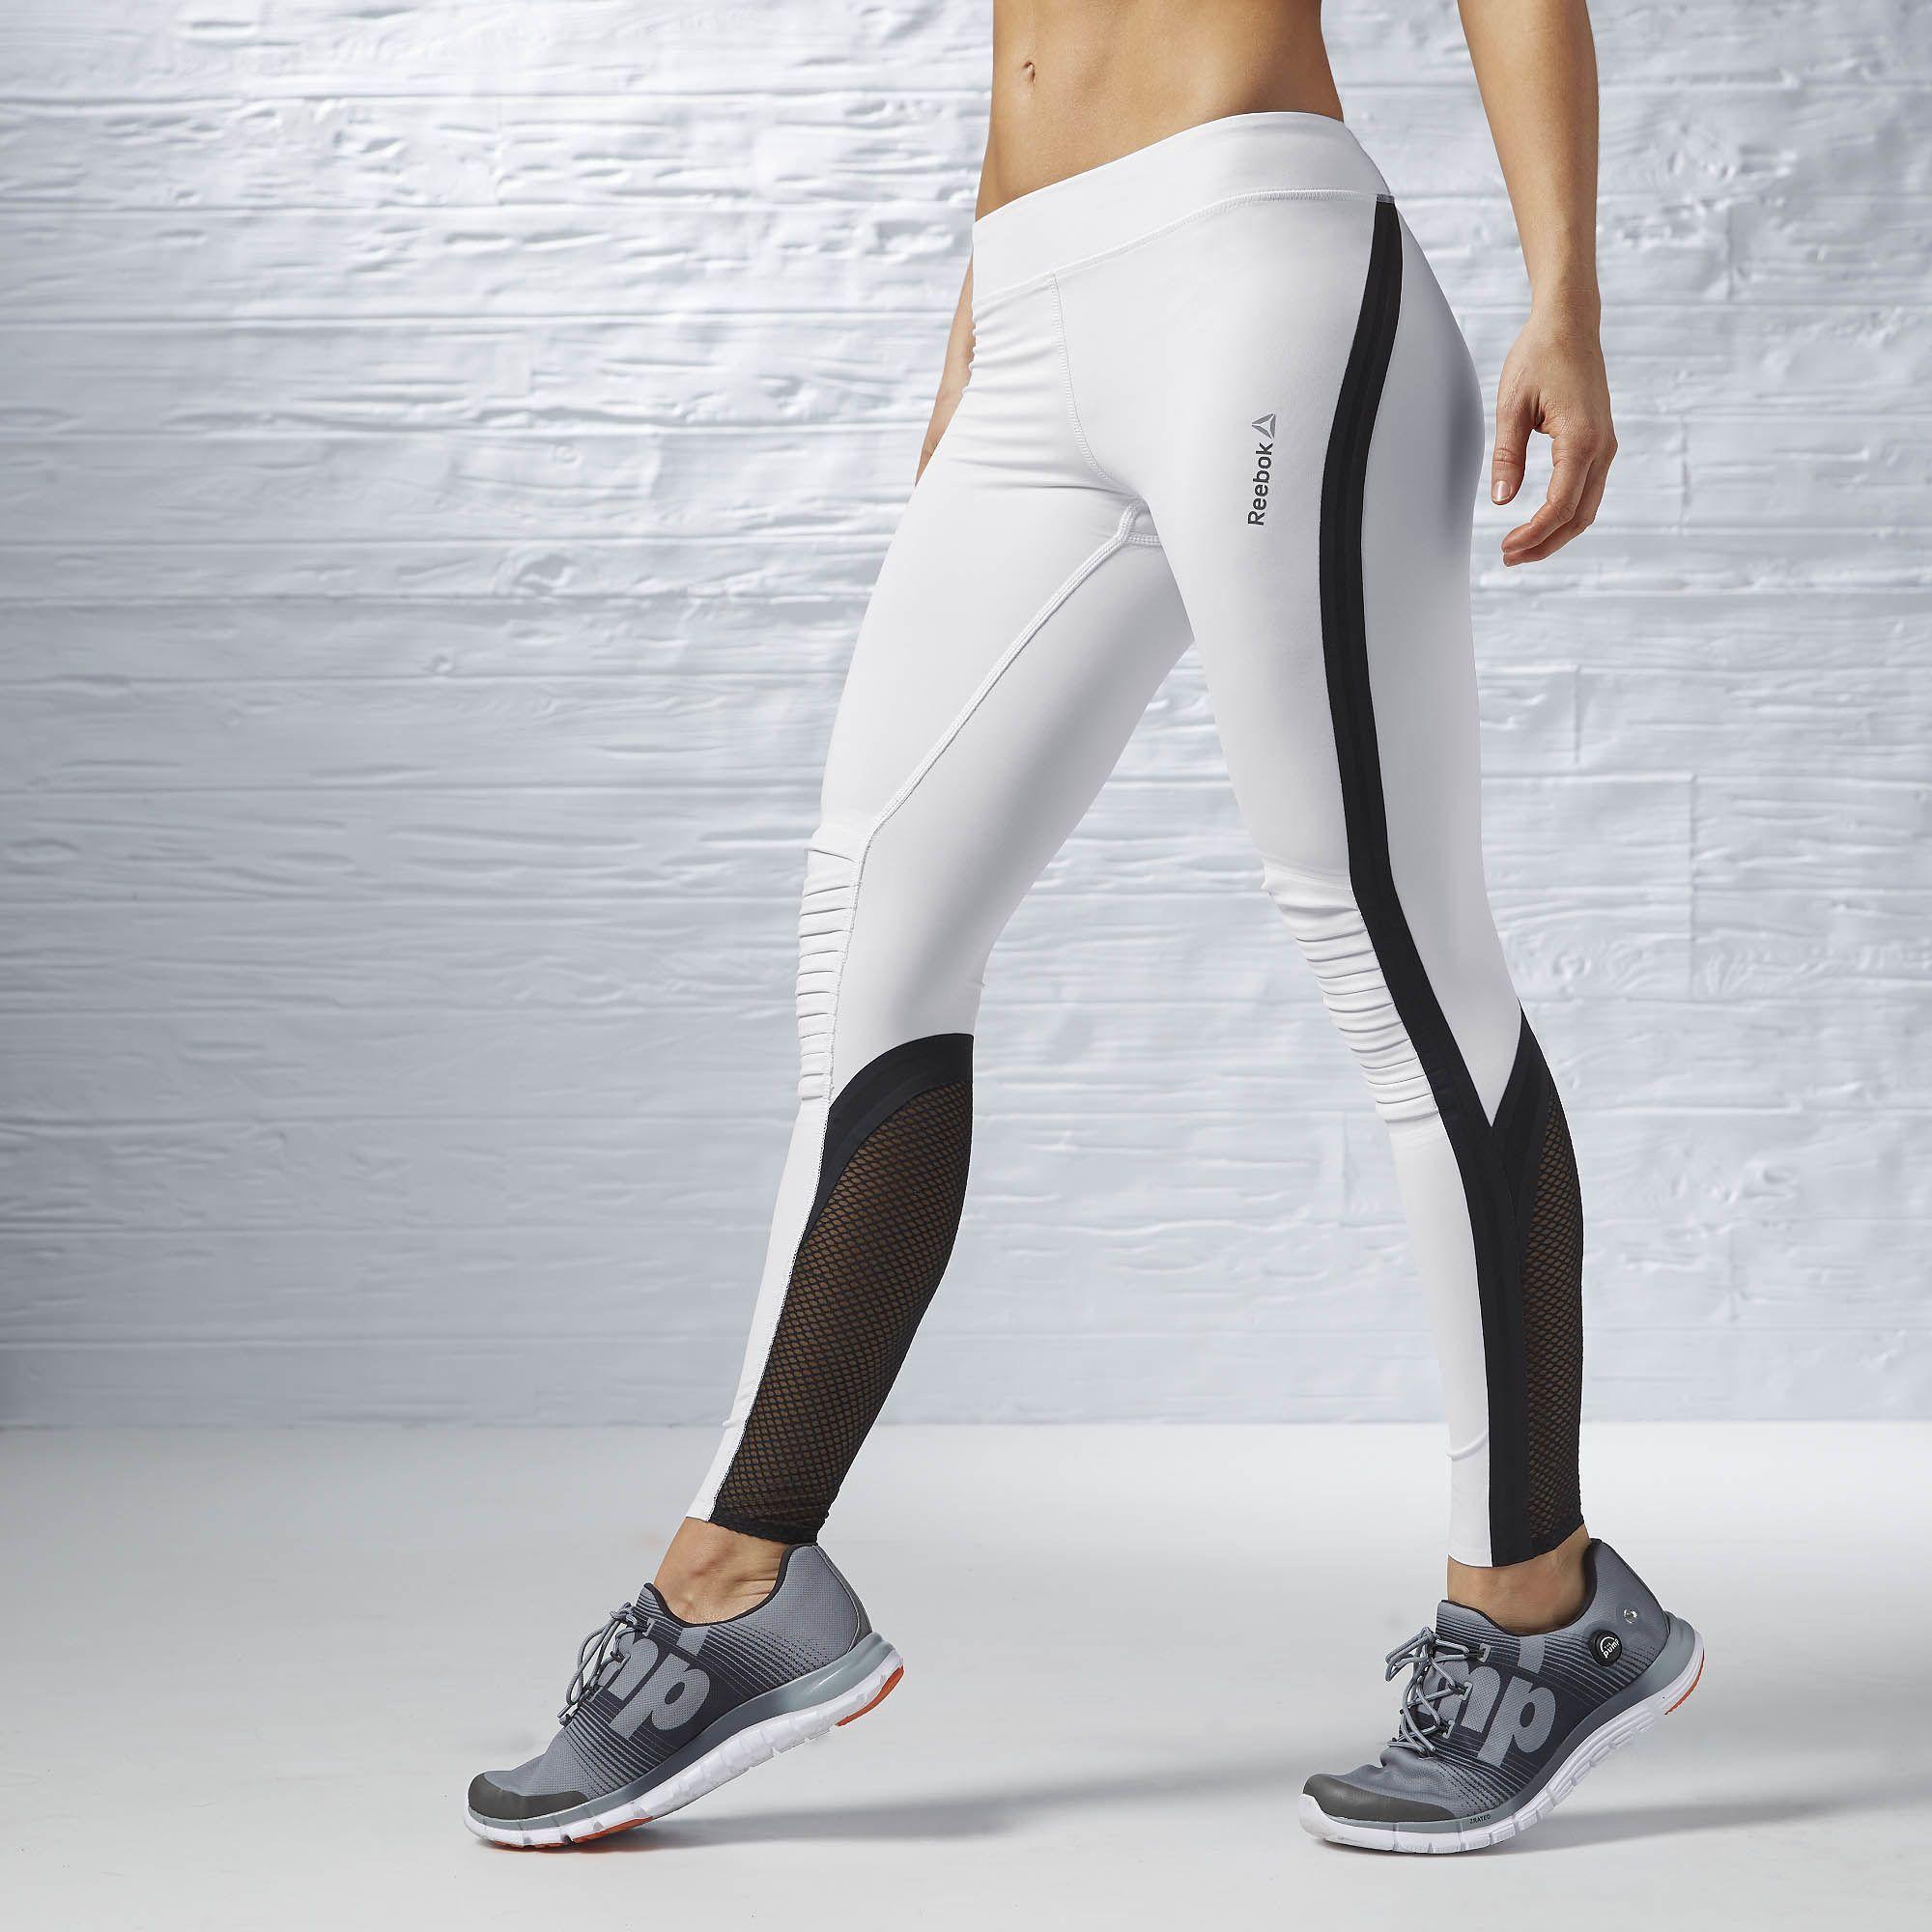 ba3df282520d2 Reebok Femmes Meshed Paneled Leggings - White